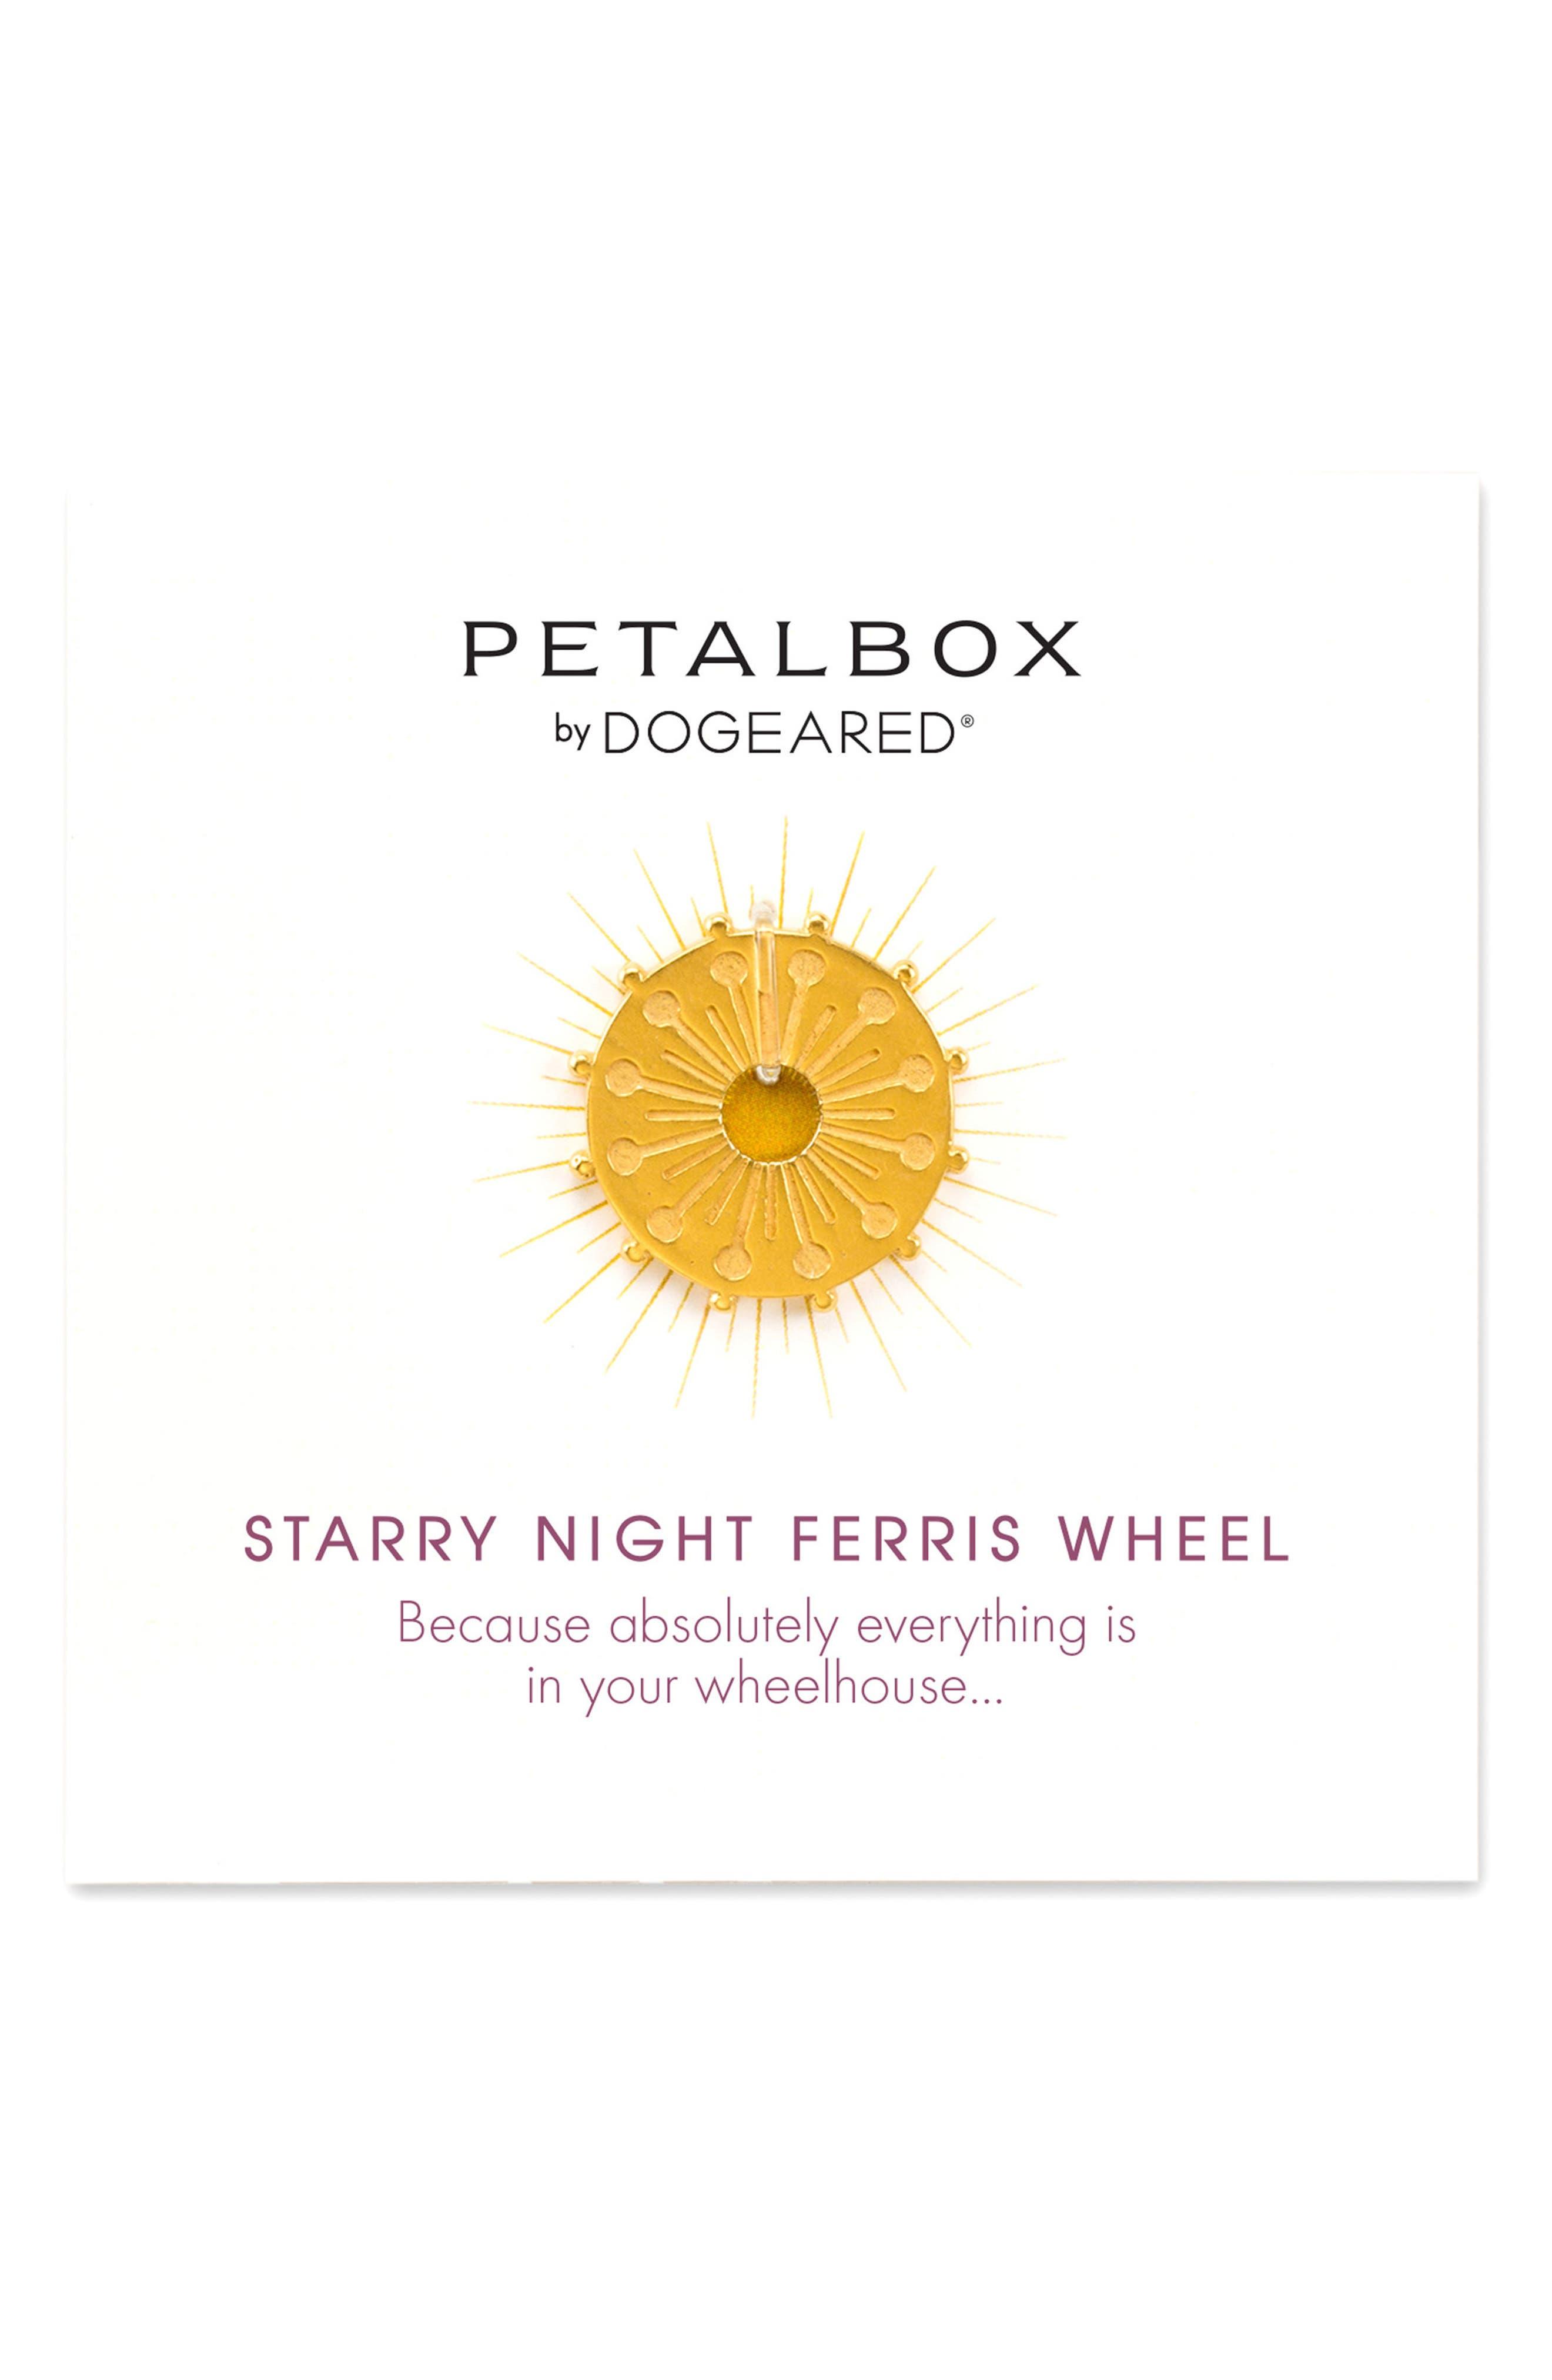 DOGEARED Petalbox Starry Night Ferris Wheel Enhancer